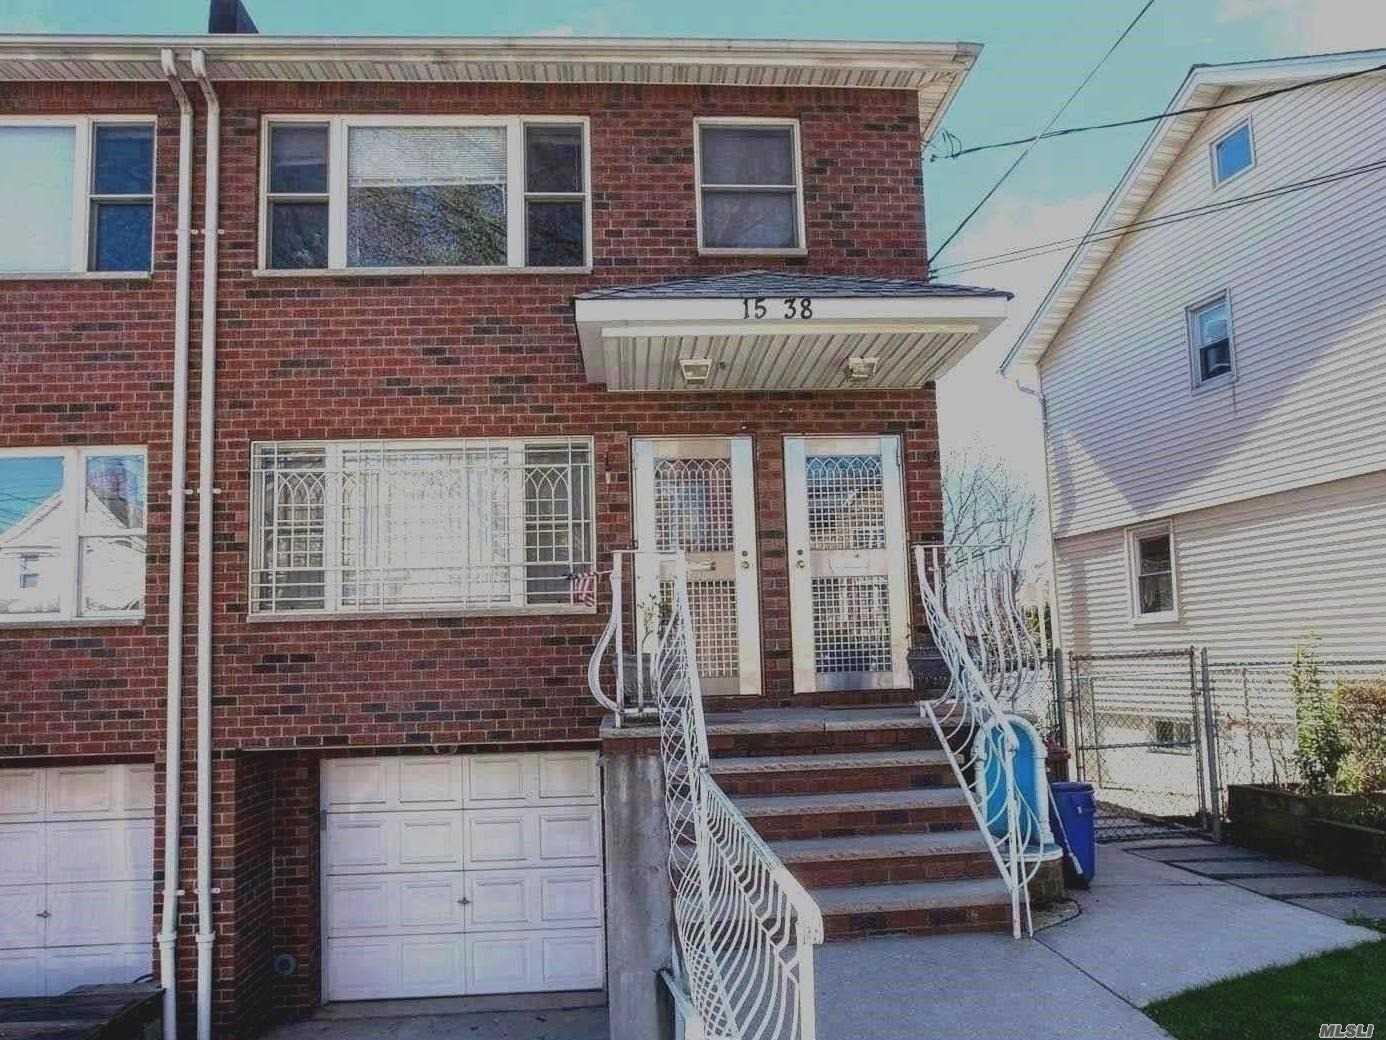 Property for sale at 1538 150th Place, Whitestone NY 11357, Whitestone,  New York 11357